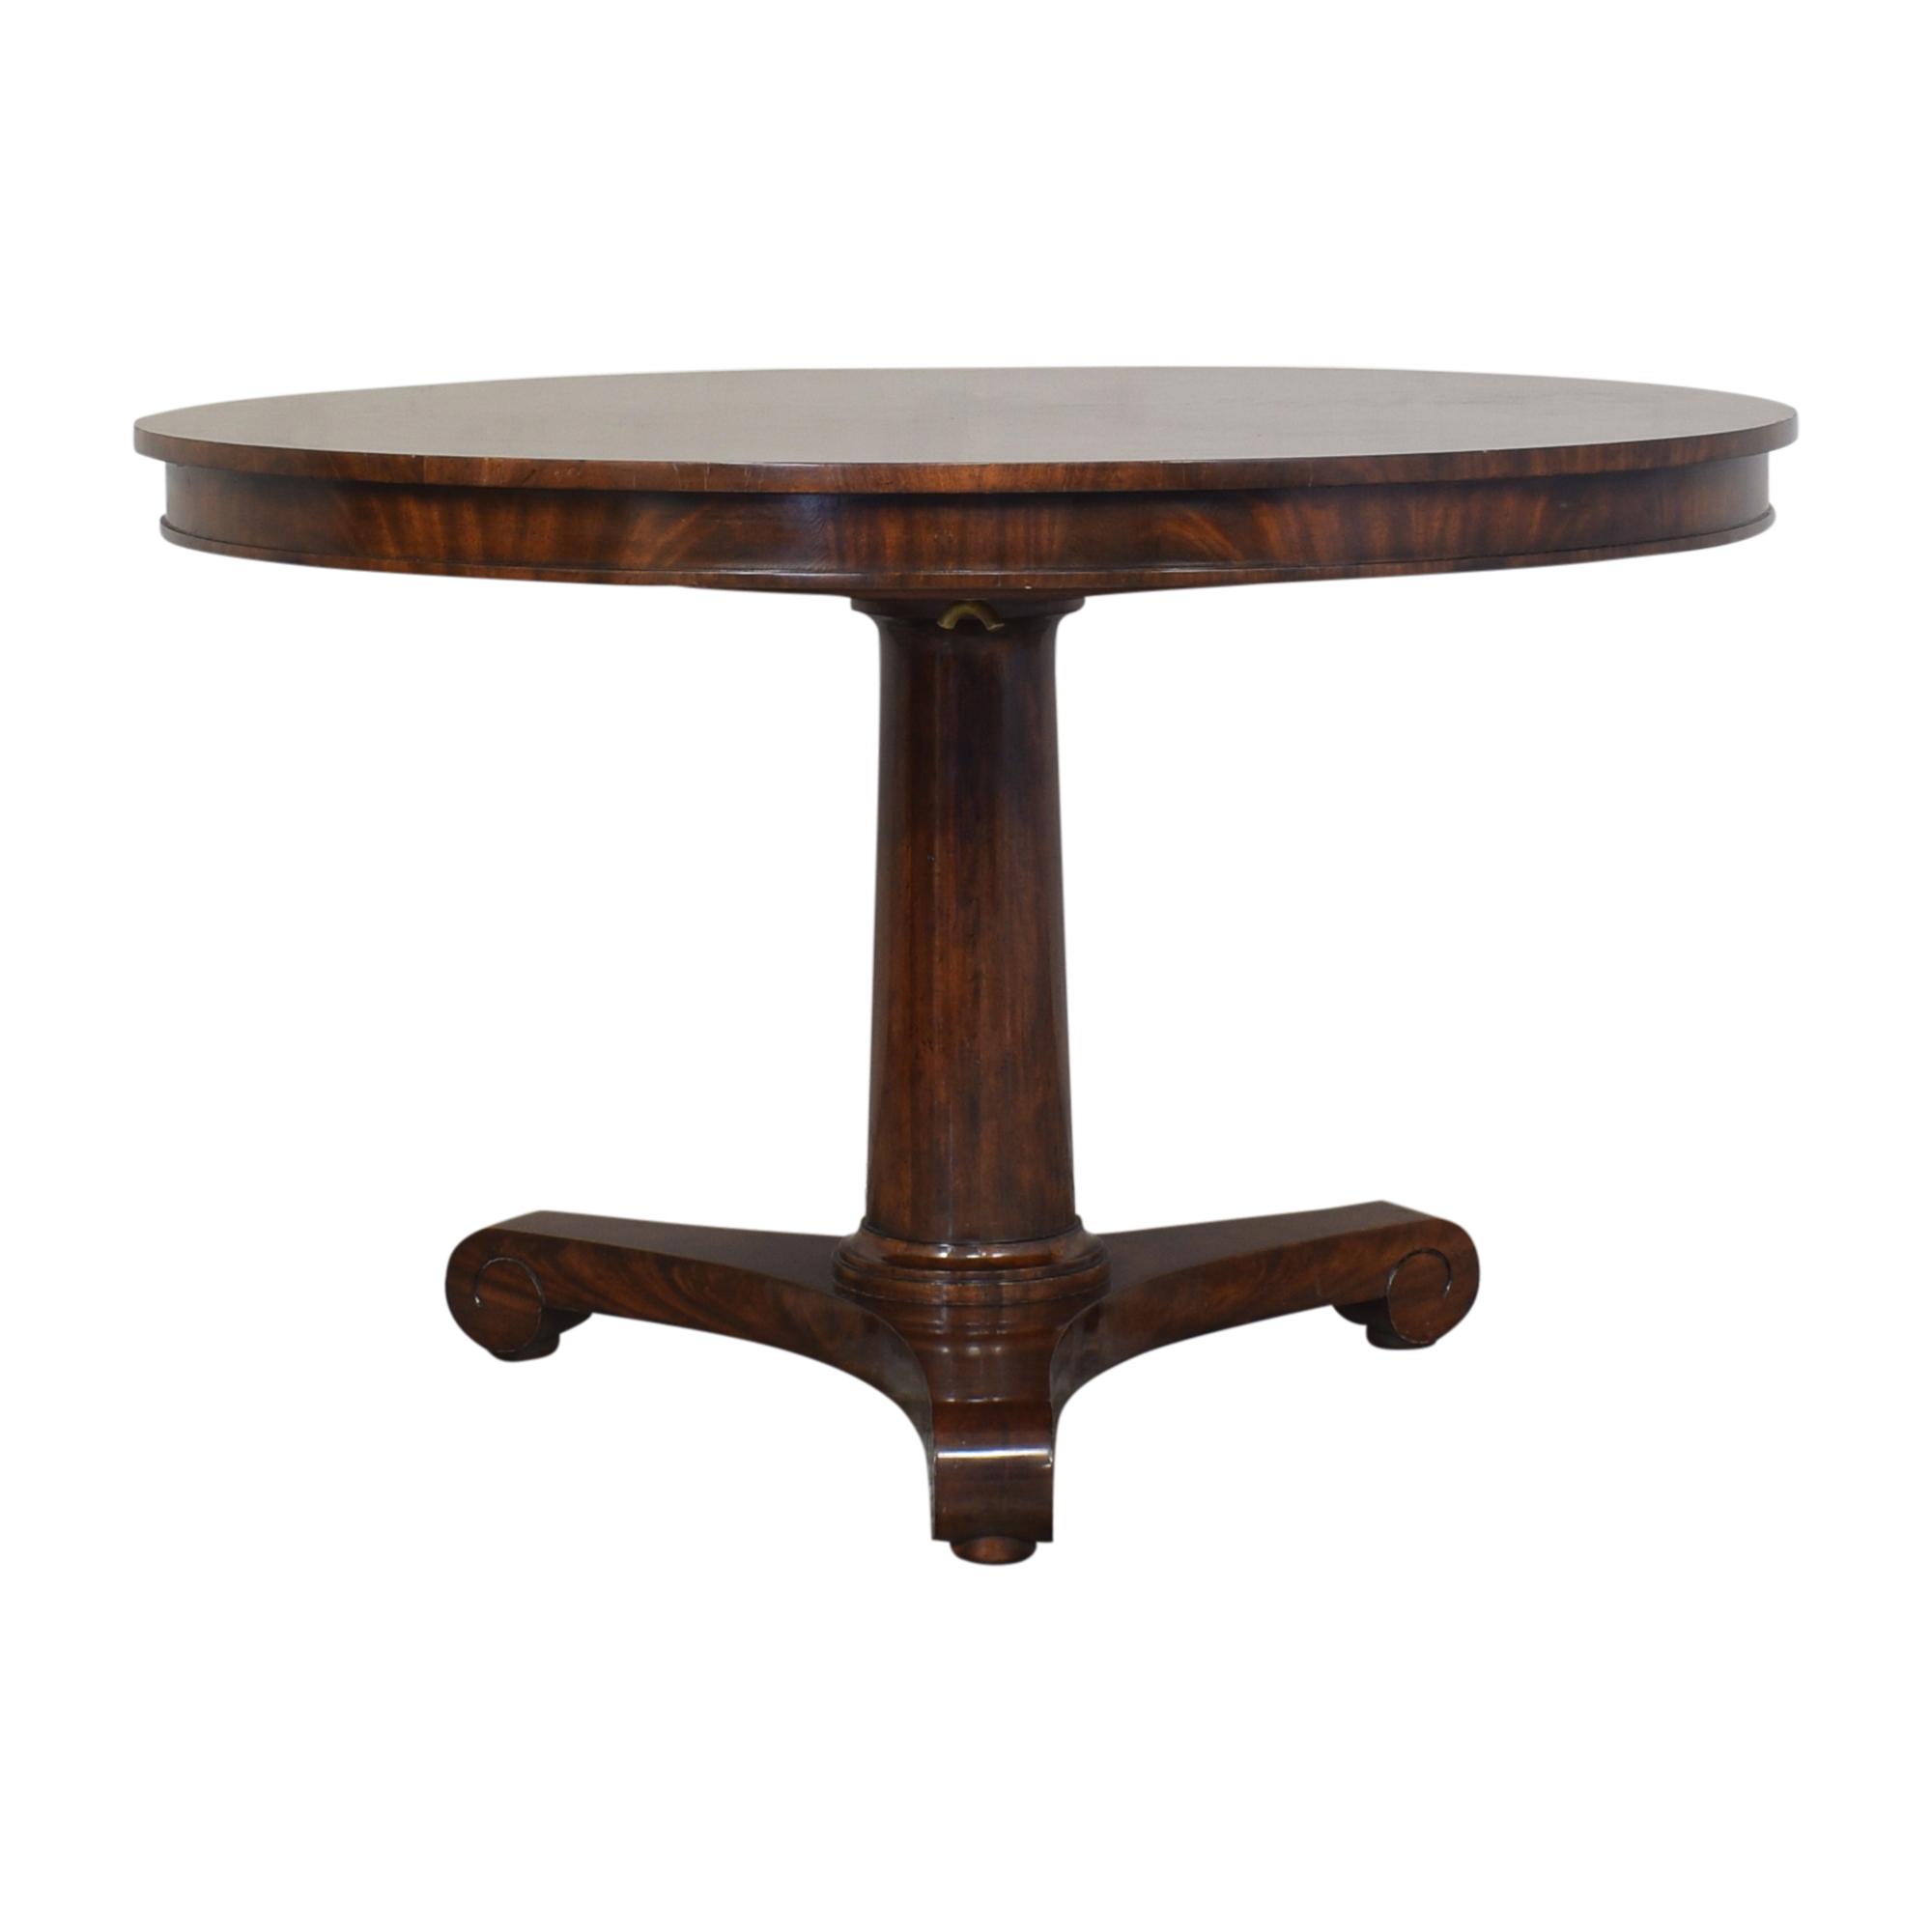 ABC Carpet & Home Pedestal Dining Table / Dinner Tables